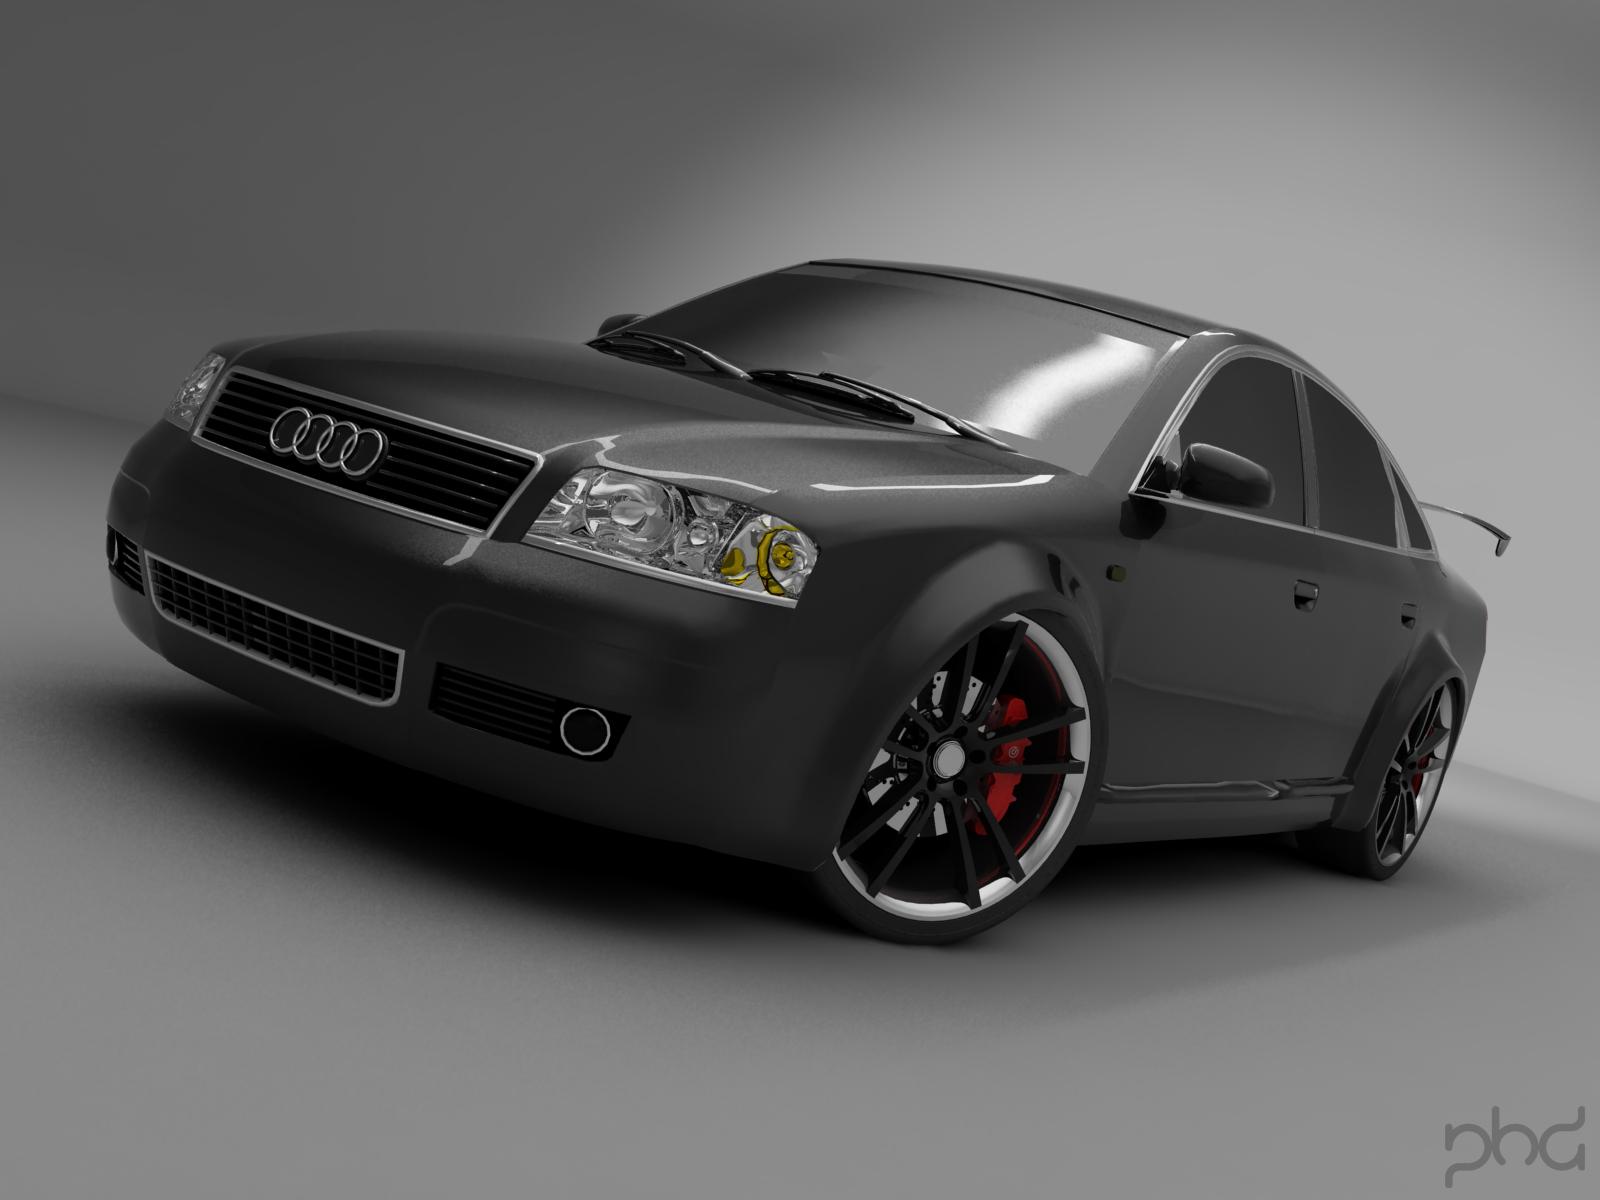 AUDI A6 black